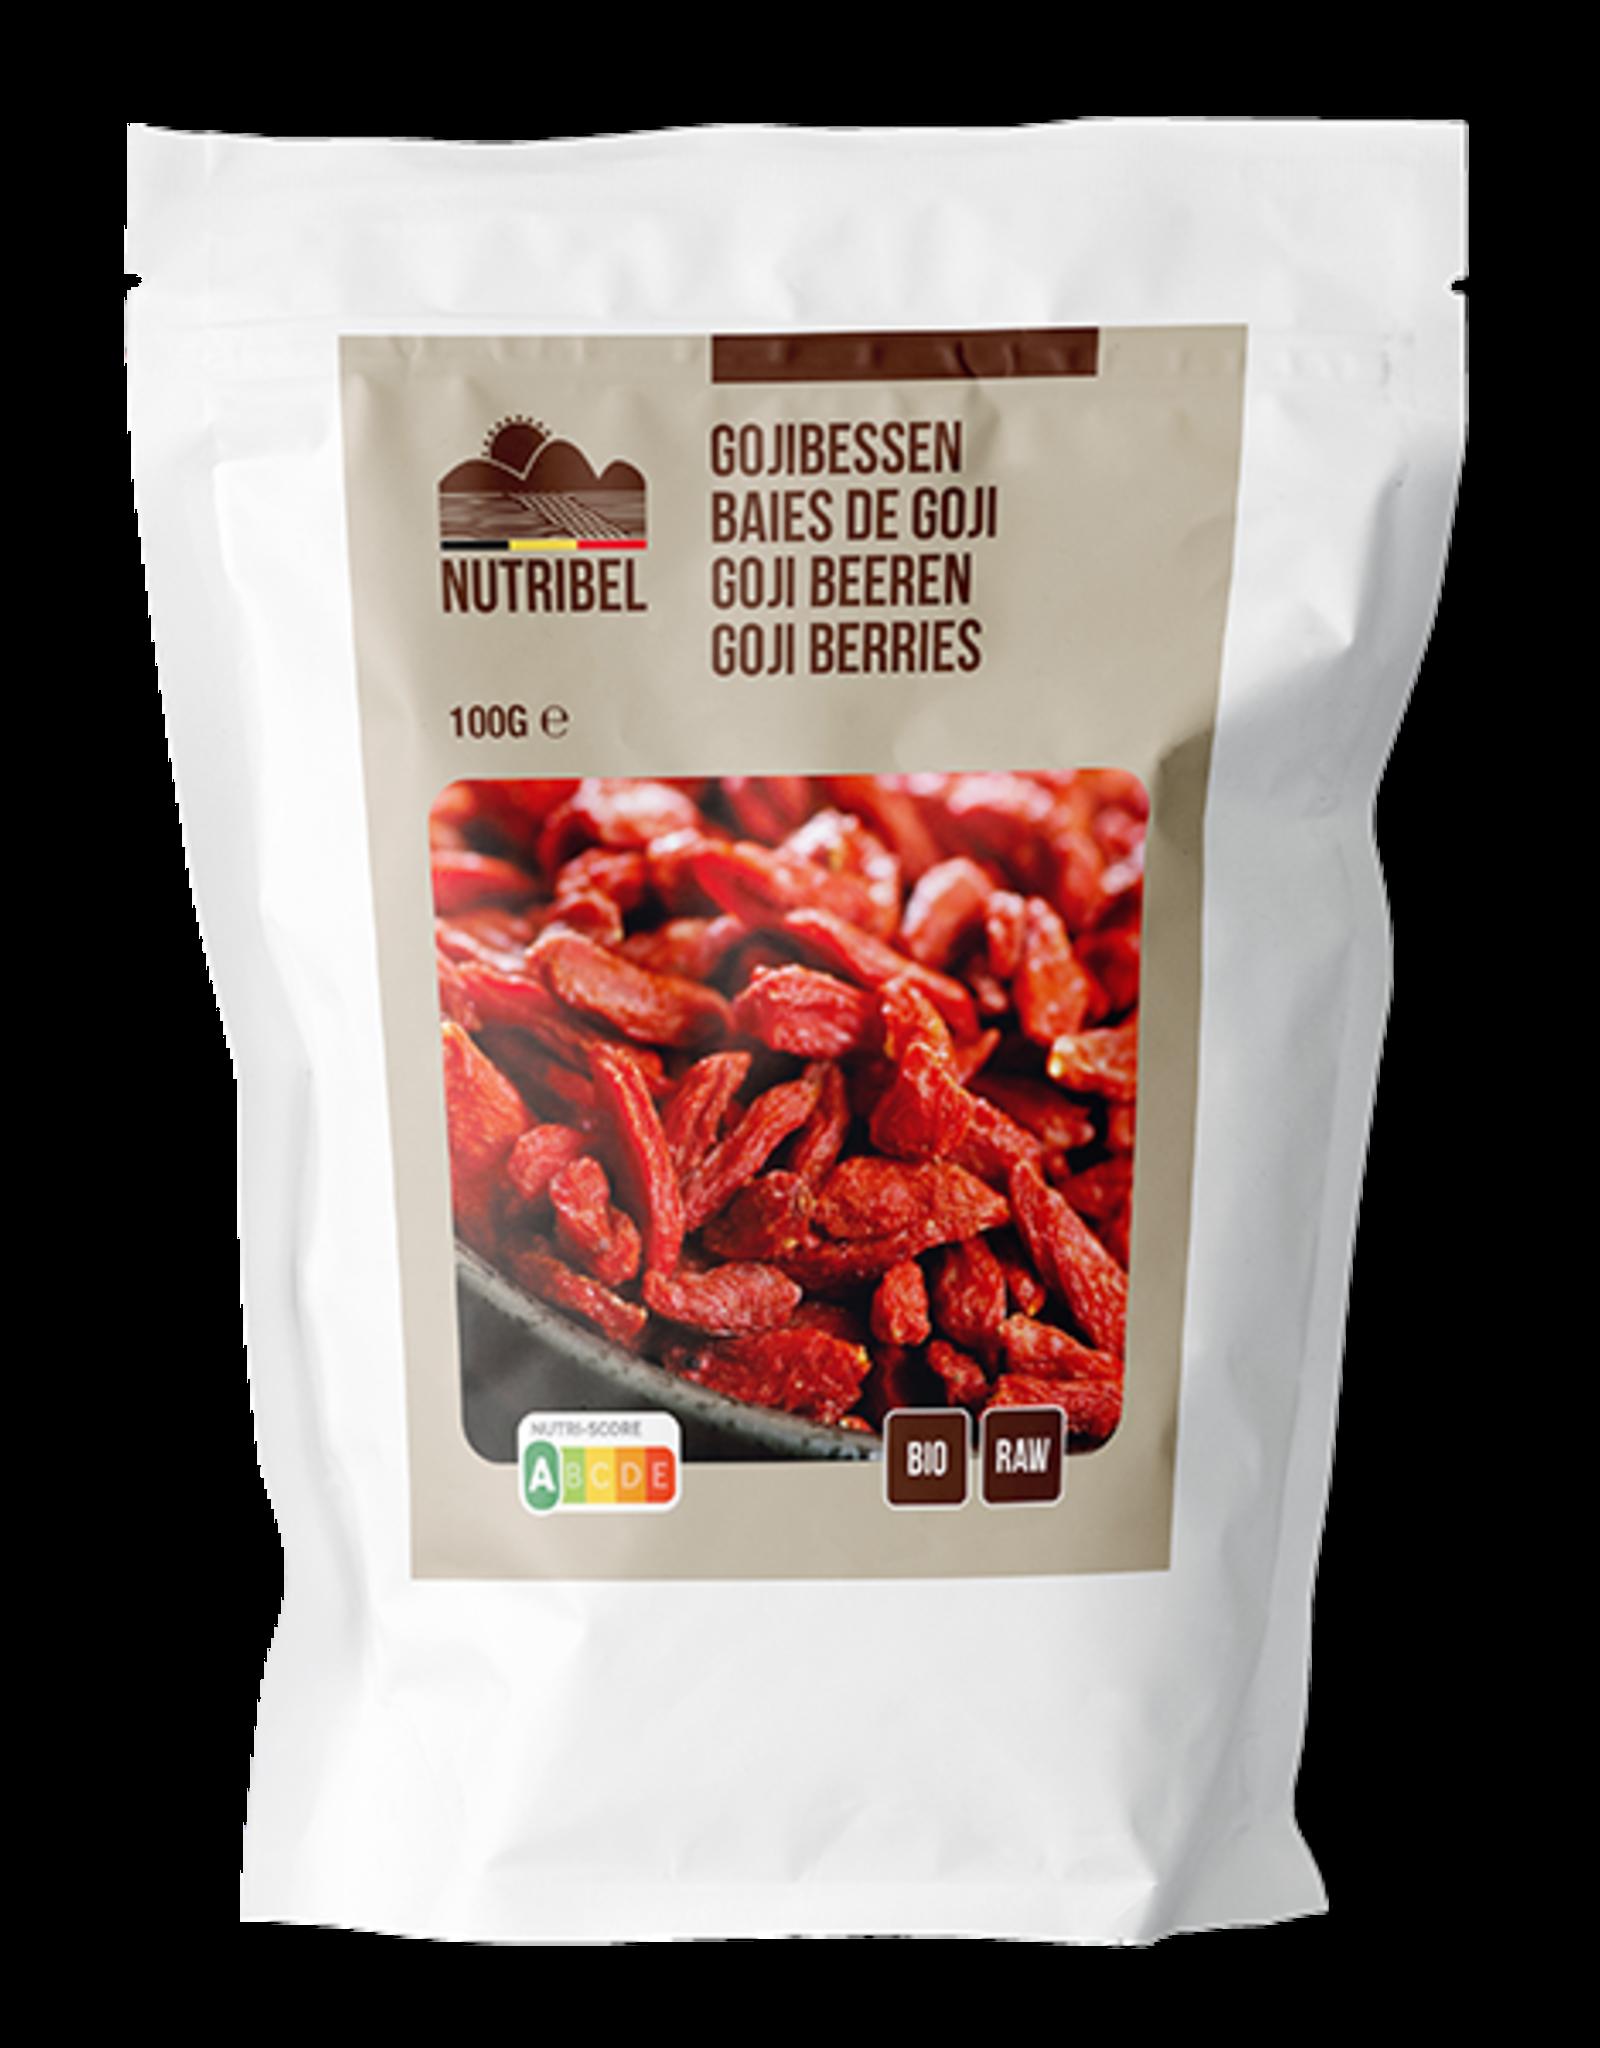 Nutribel Gojibessen bio & raw 100g